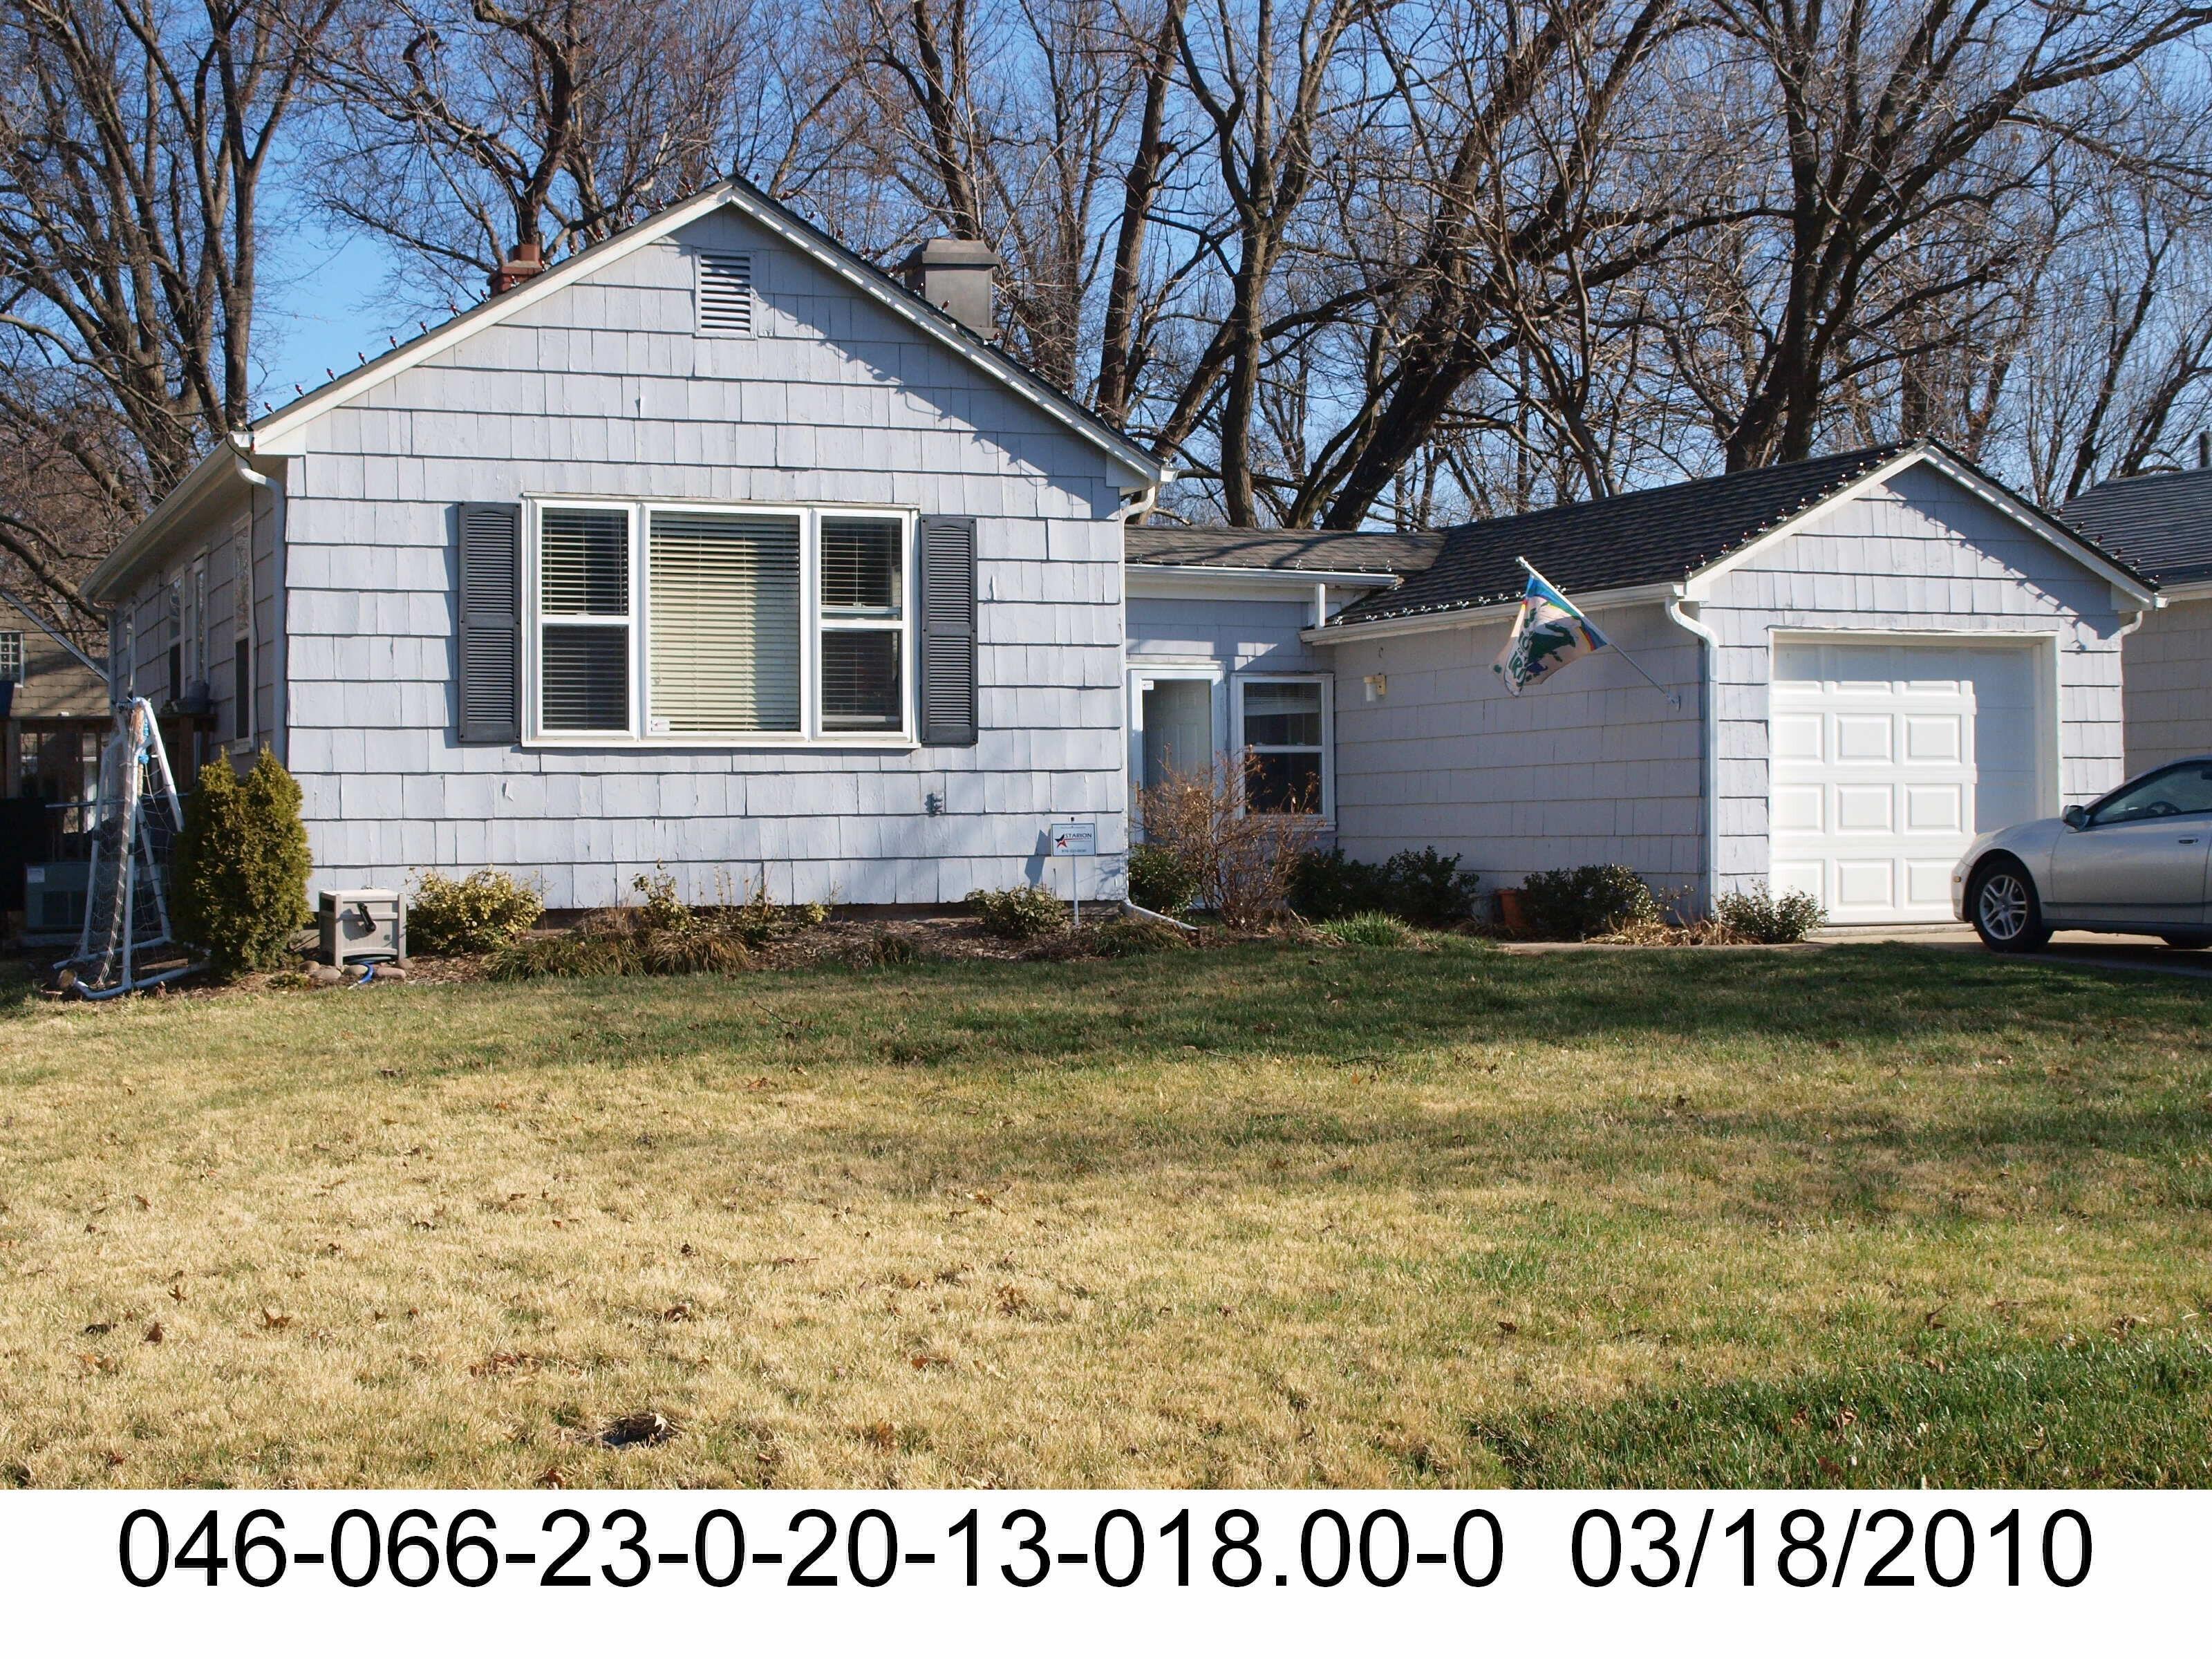 Kansas johnson county prairie village -  140 463 Property In Prairie Village Kansas